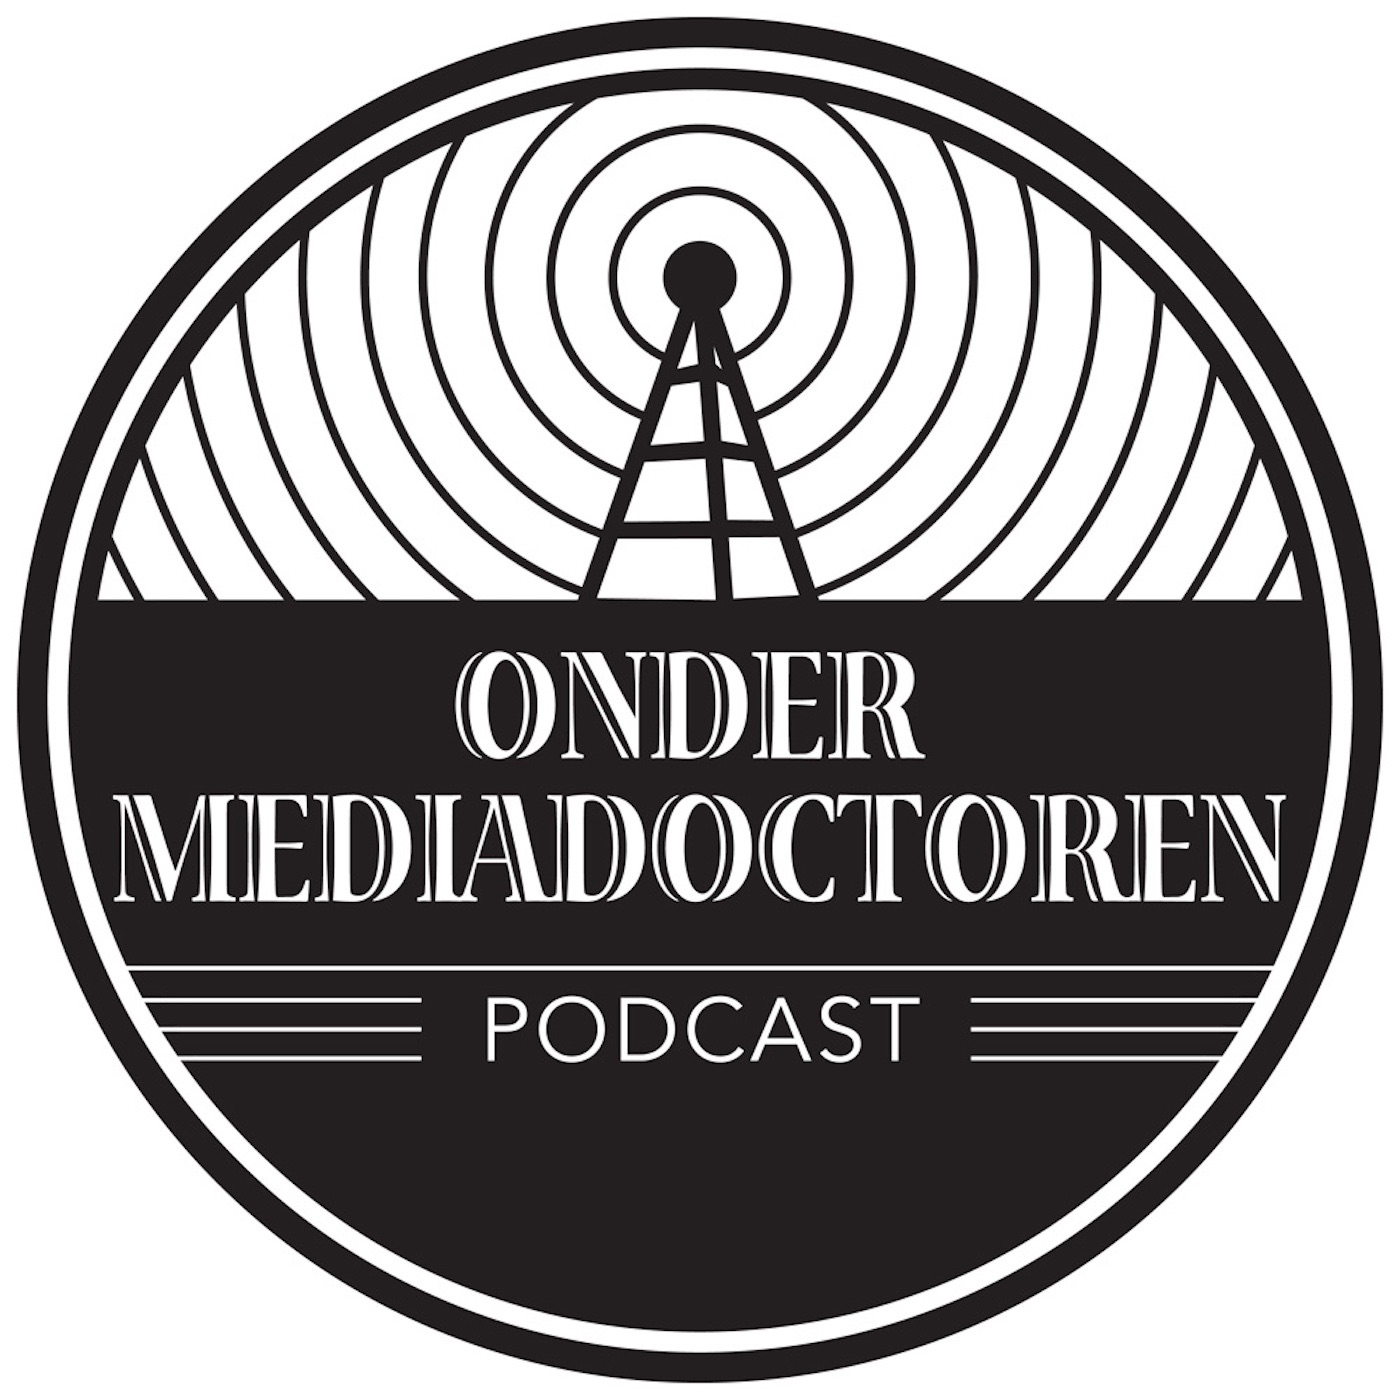 Onder Mediadoctoren logo